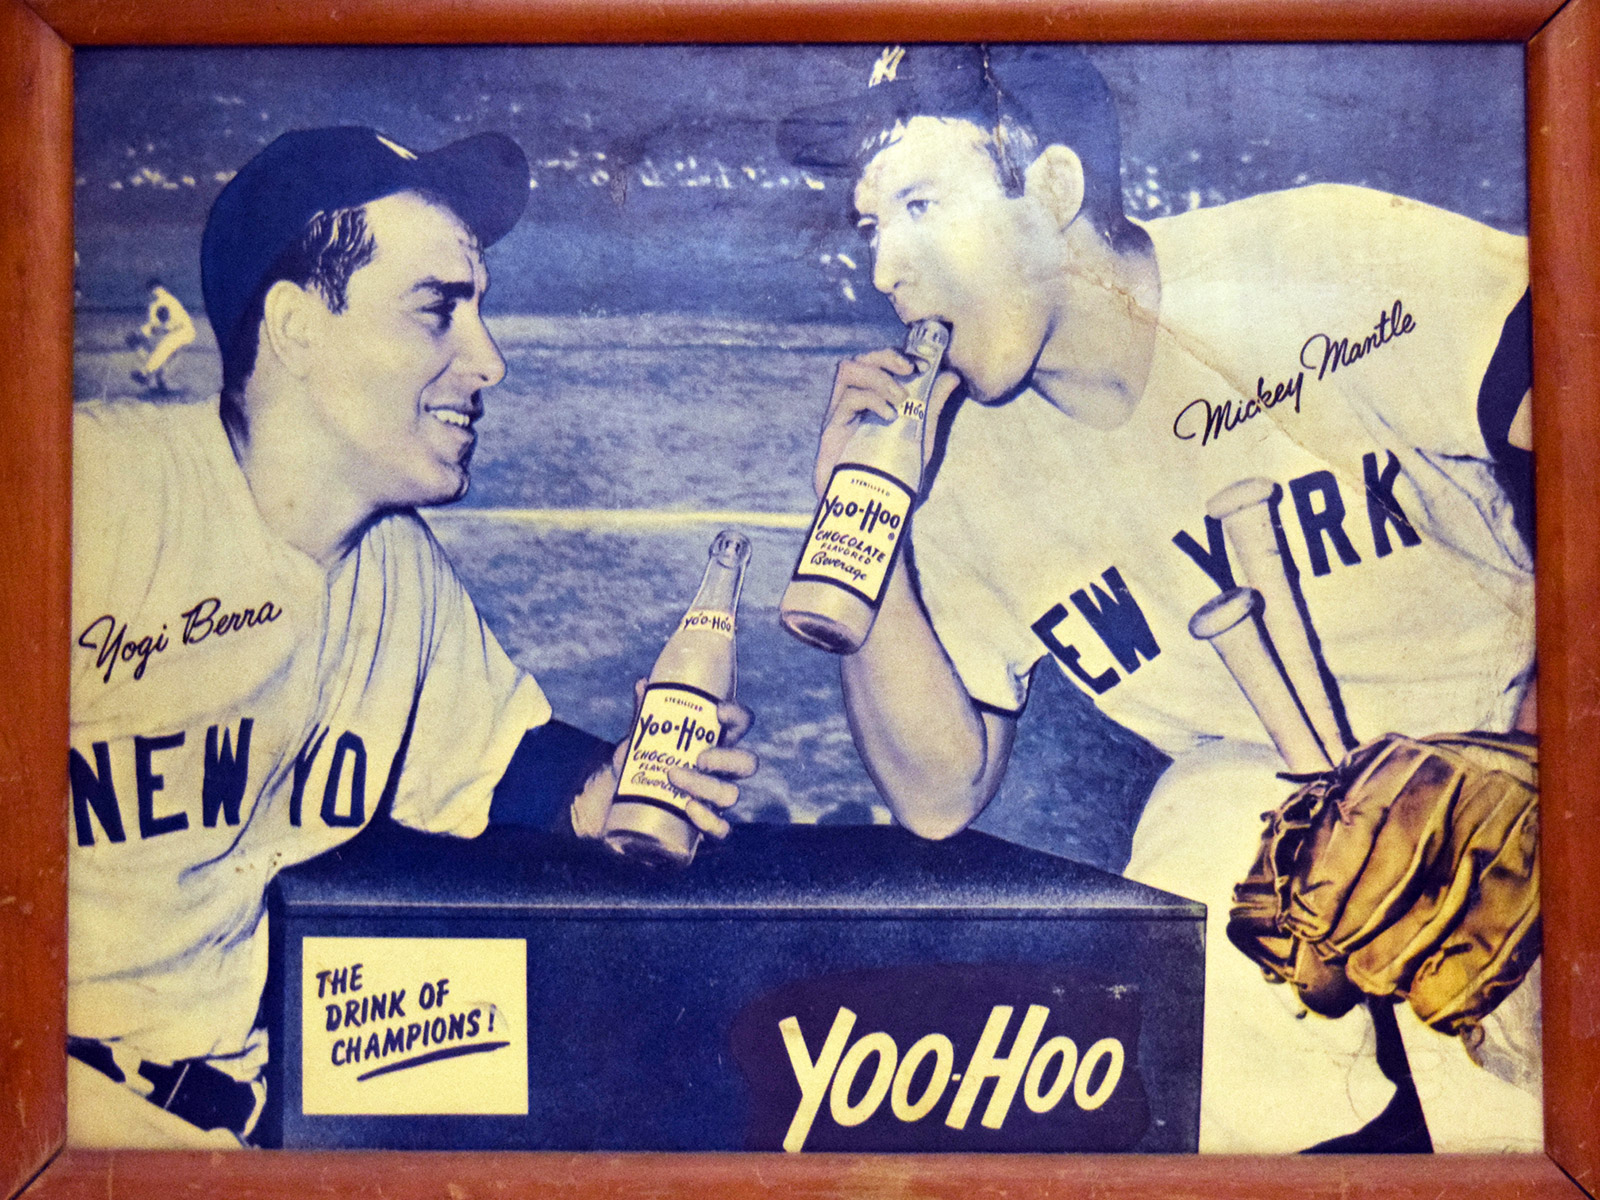 EC: Rare Yoo-hoo Advertisement Featuring Yogi Berra Sells for Thousands